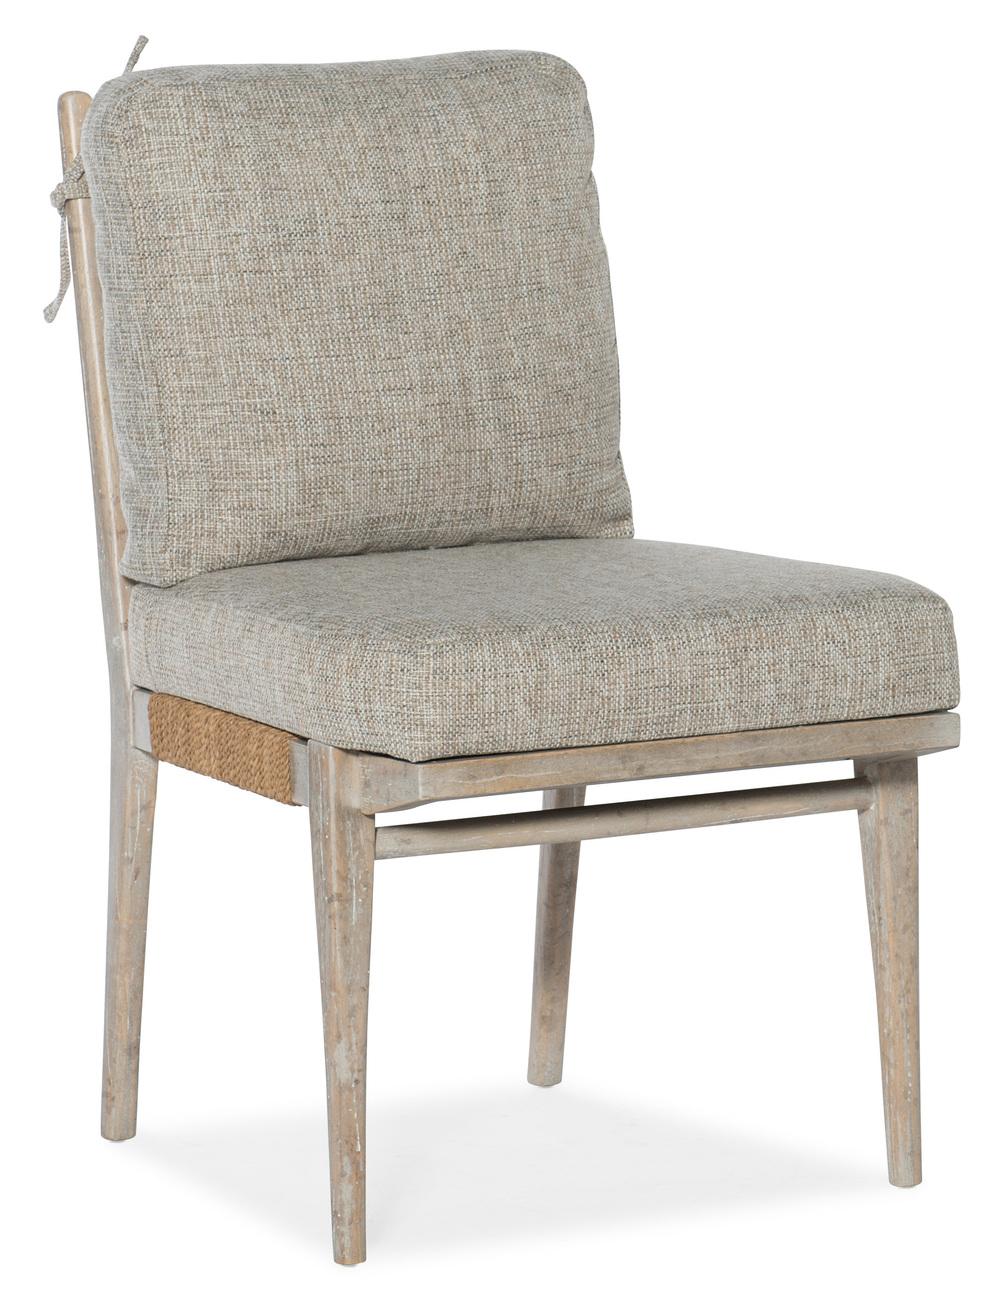 HOOKER FURNITURE CO - Upholstered Side Chair